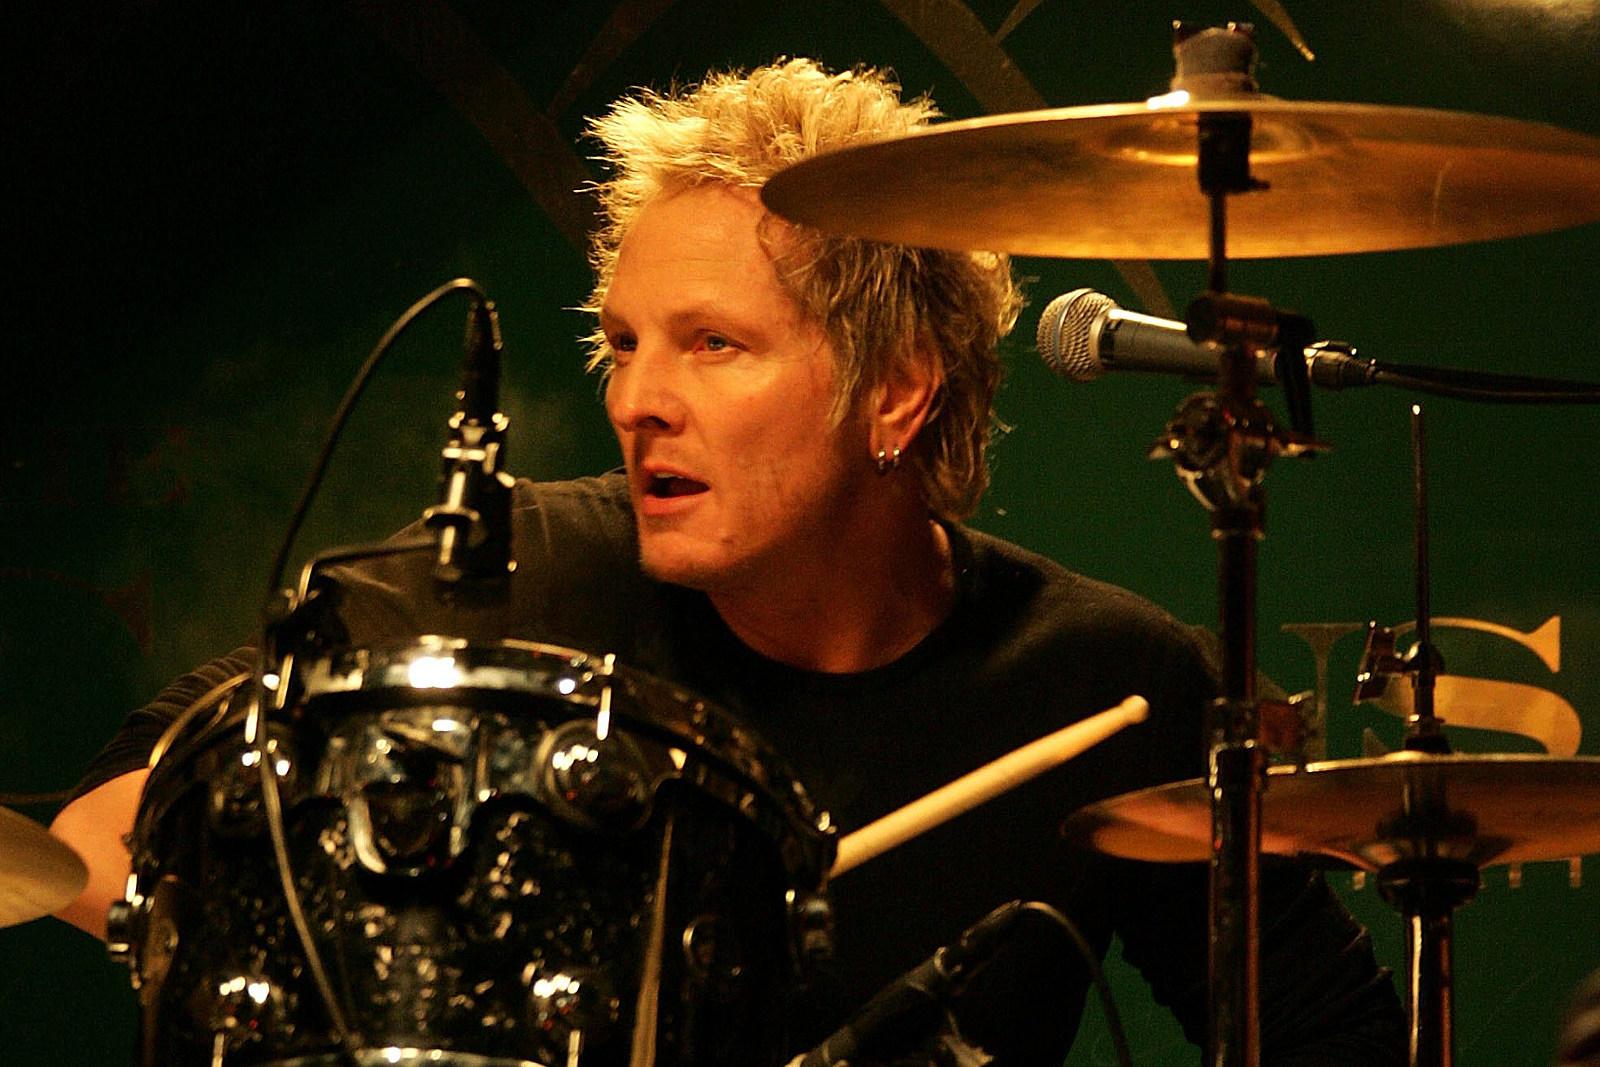 Matt Sorum Says Guns N' Roses Played Better When They Were Late